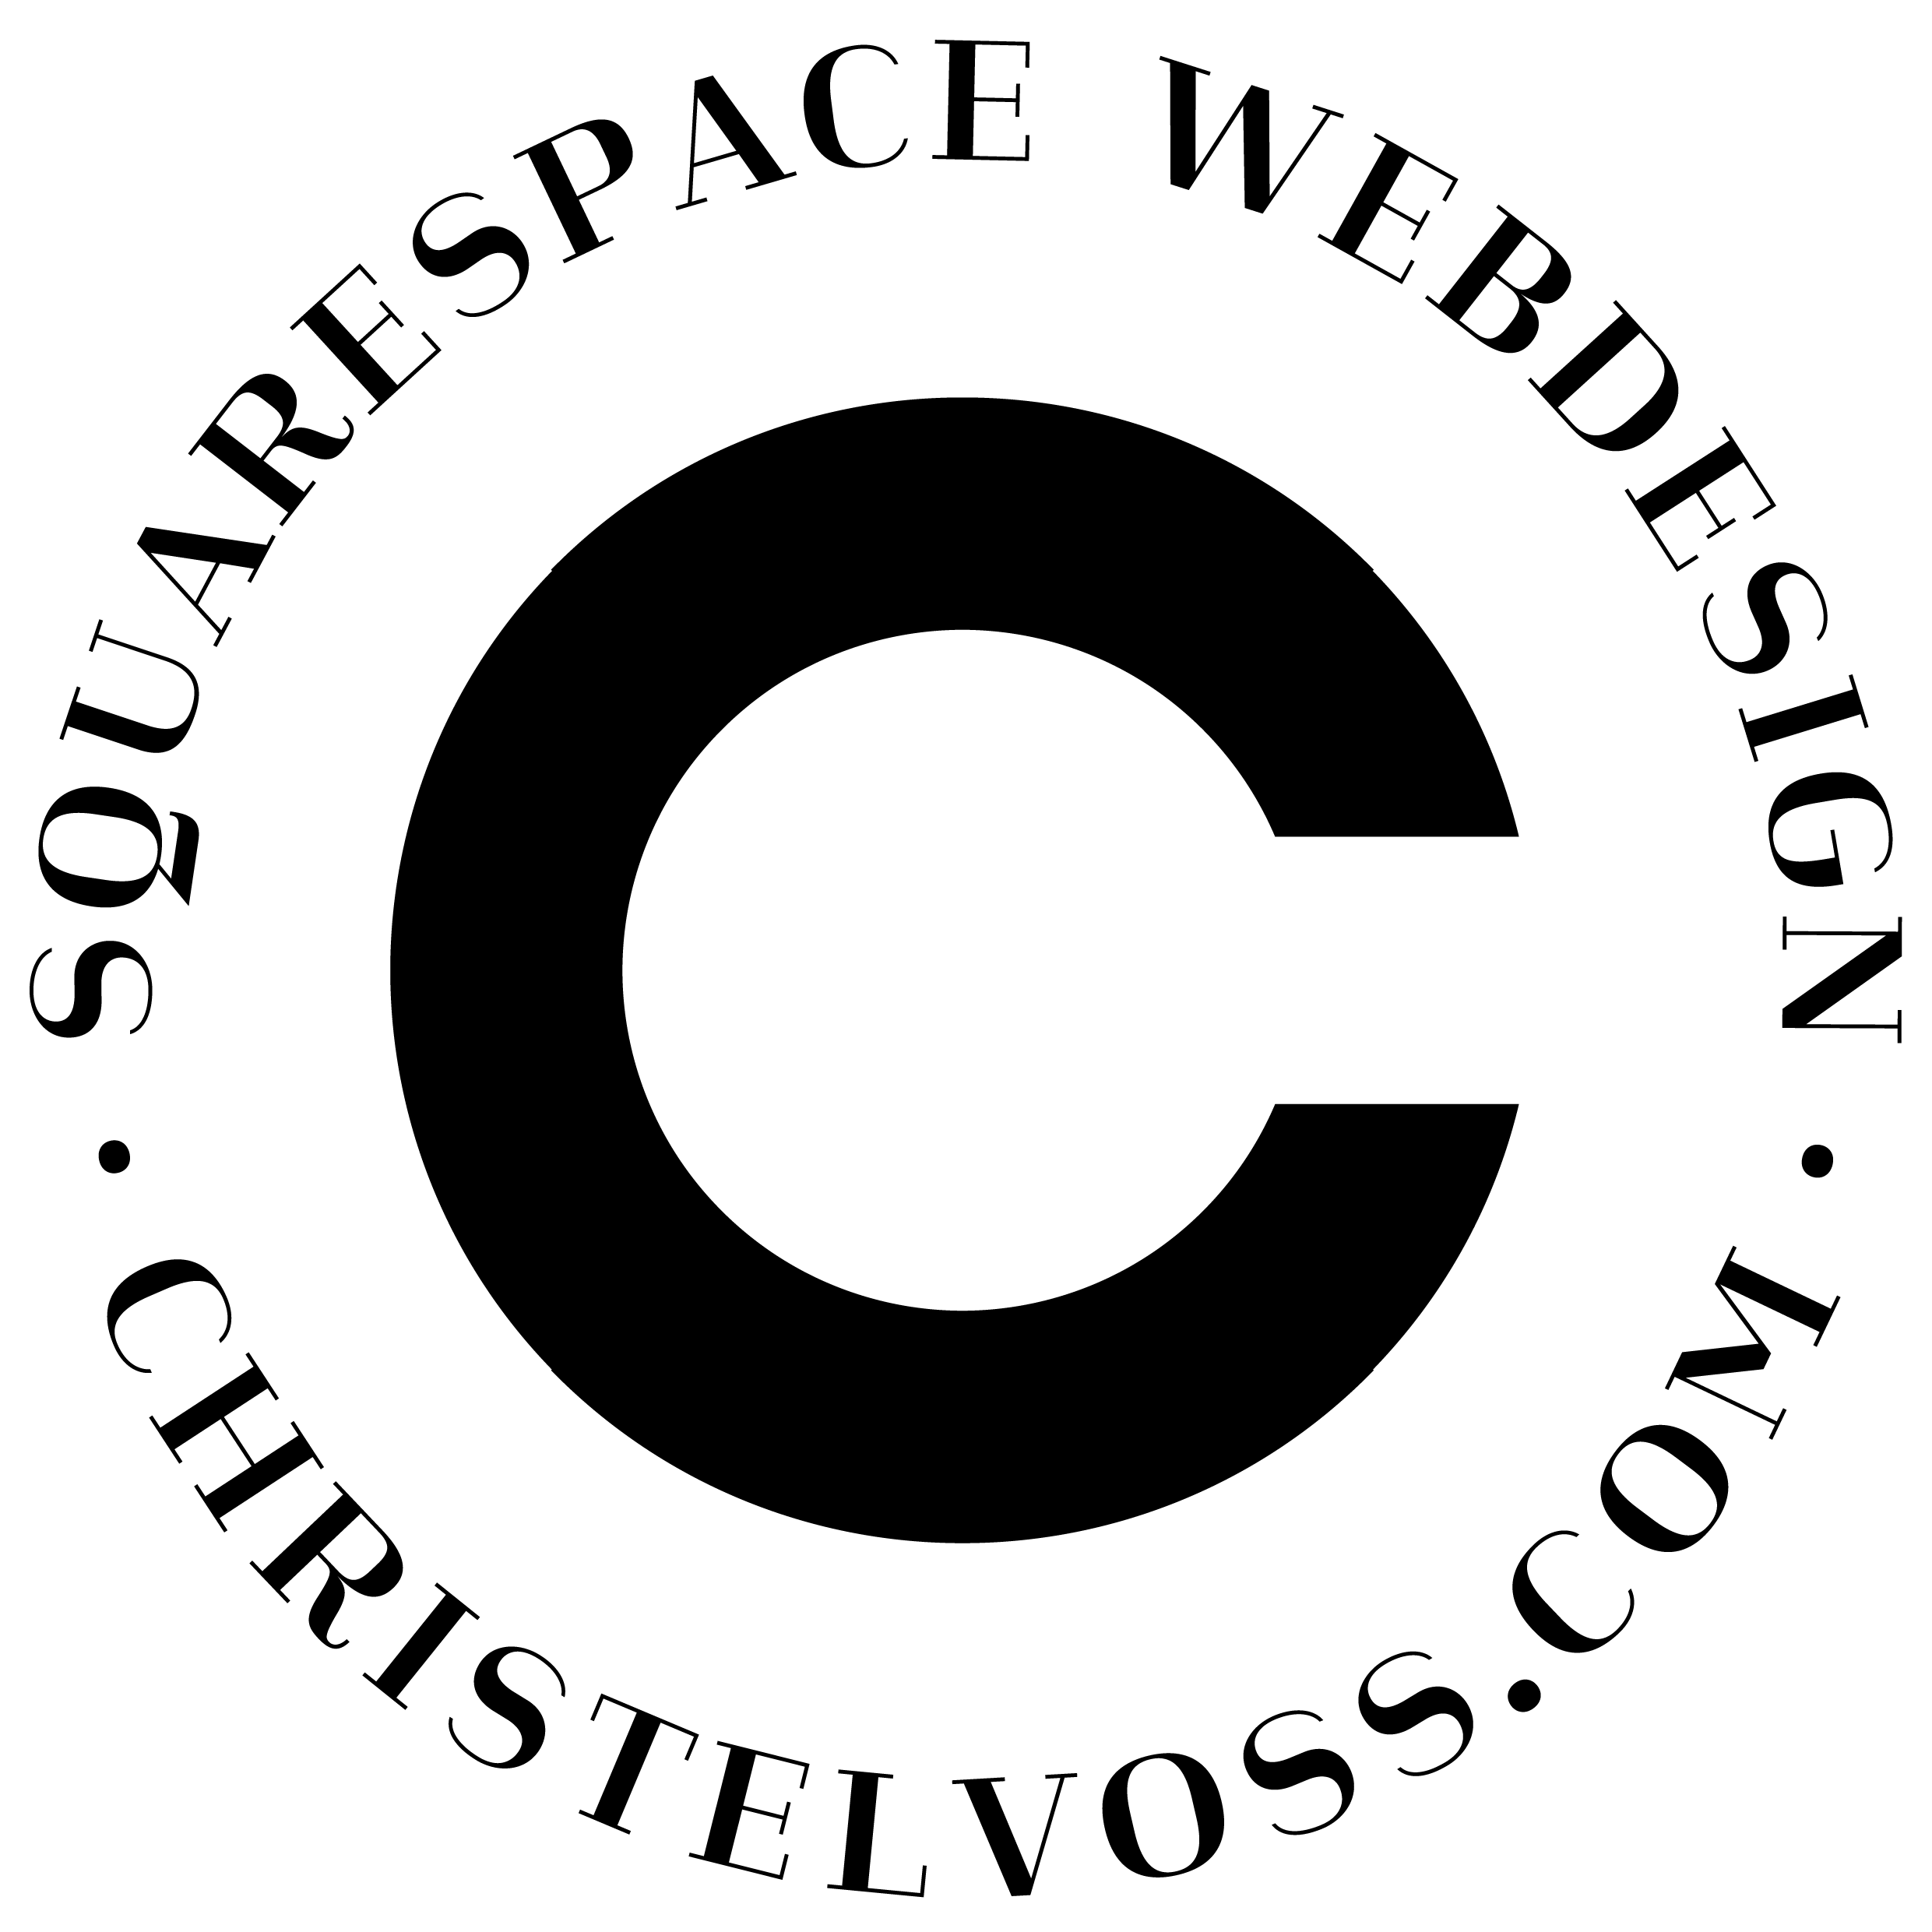 Logo-Christelvoss-Squarespace-webdesign.png